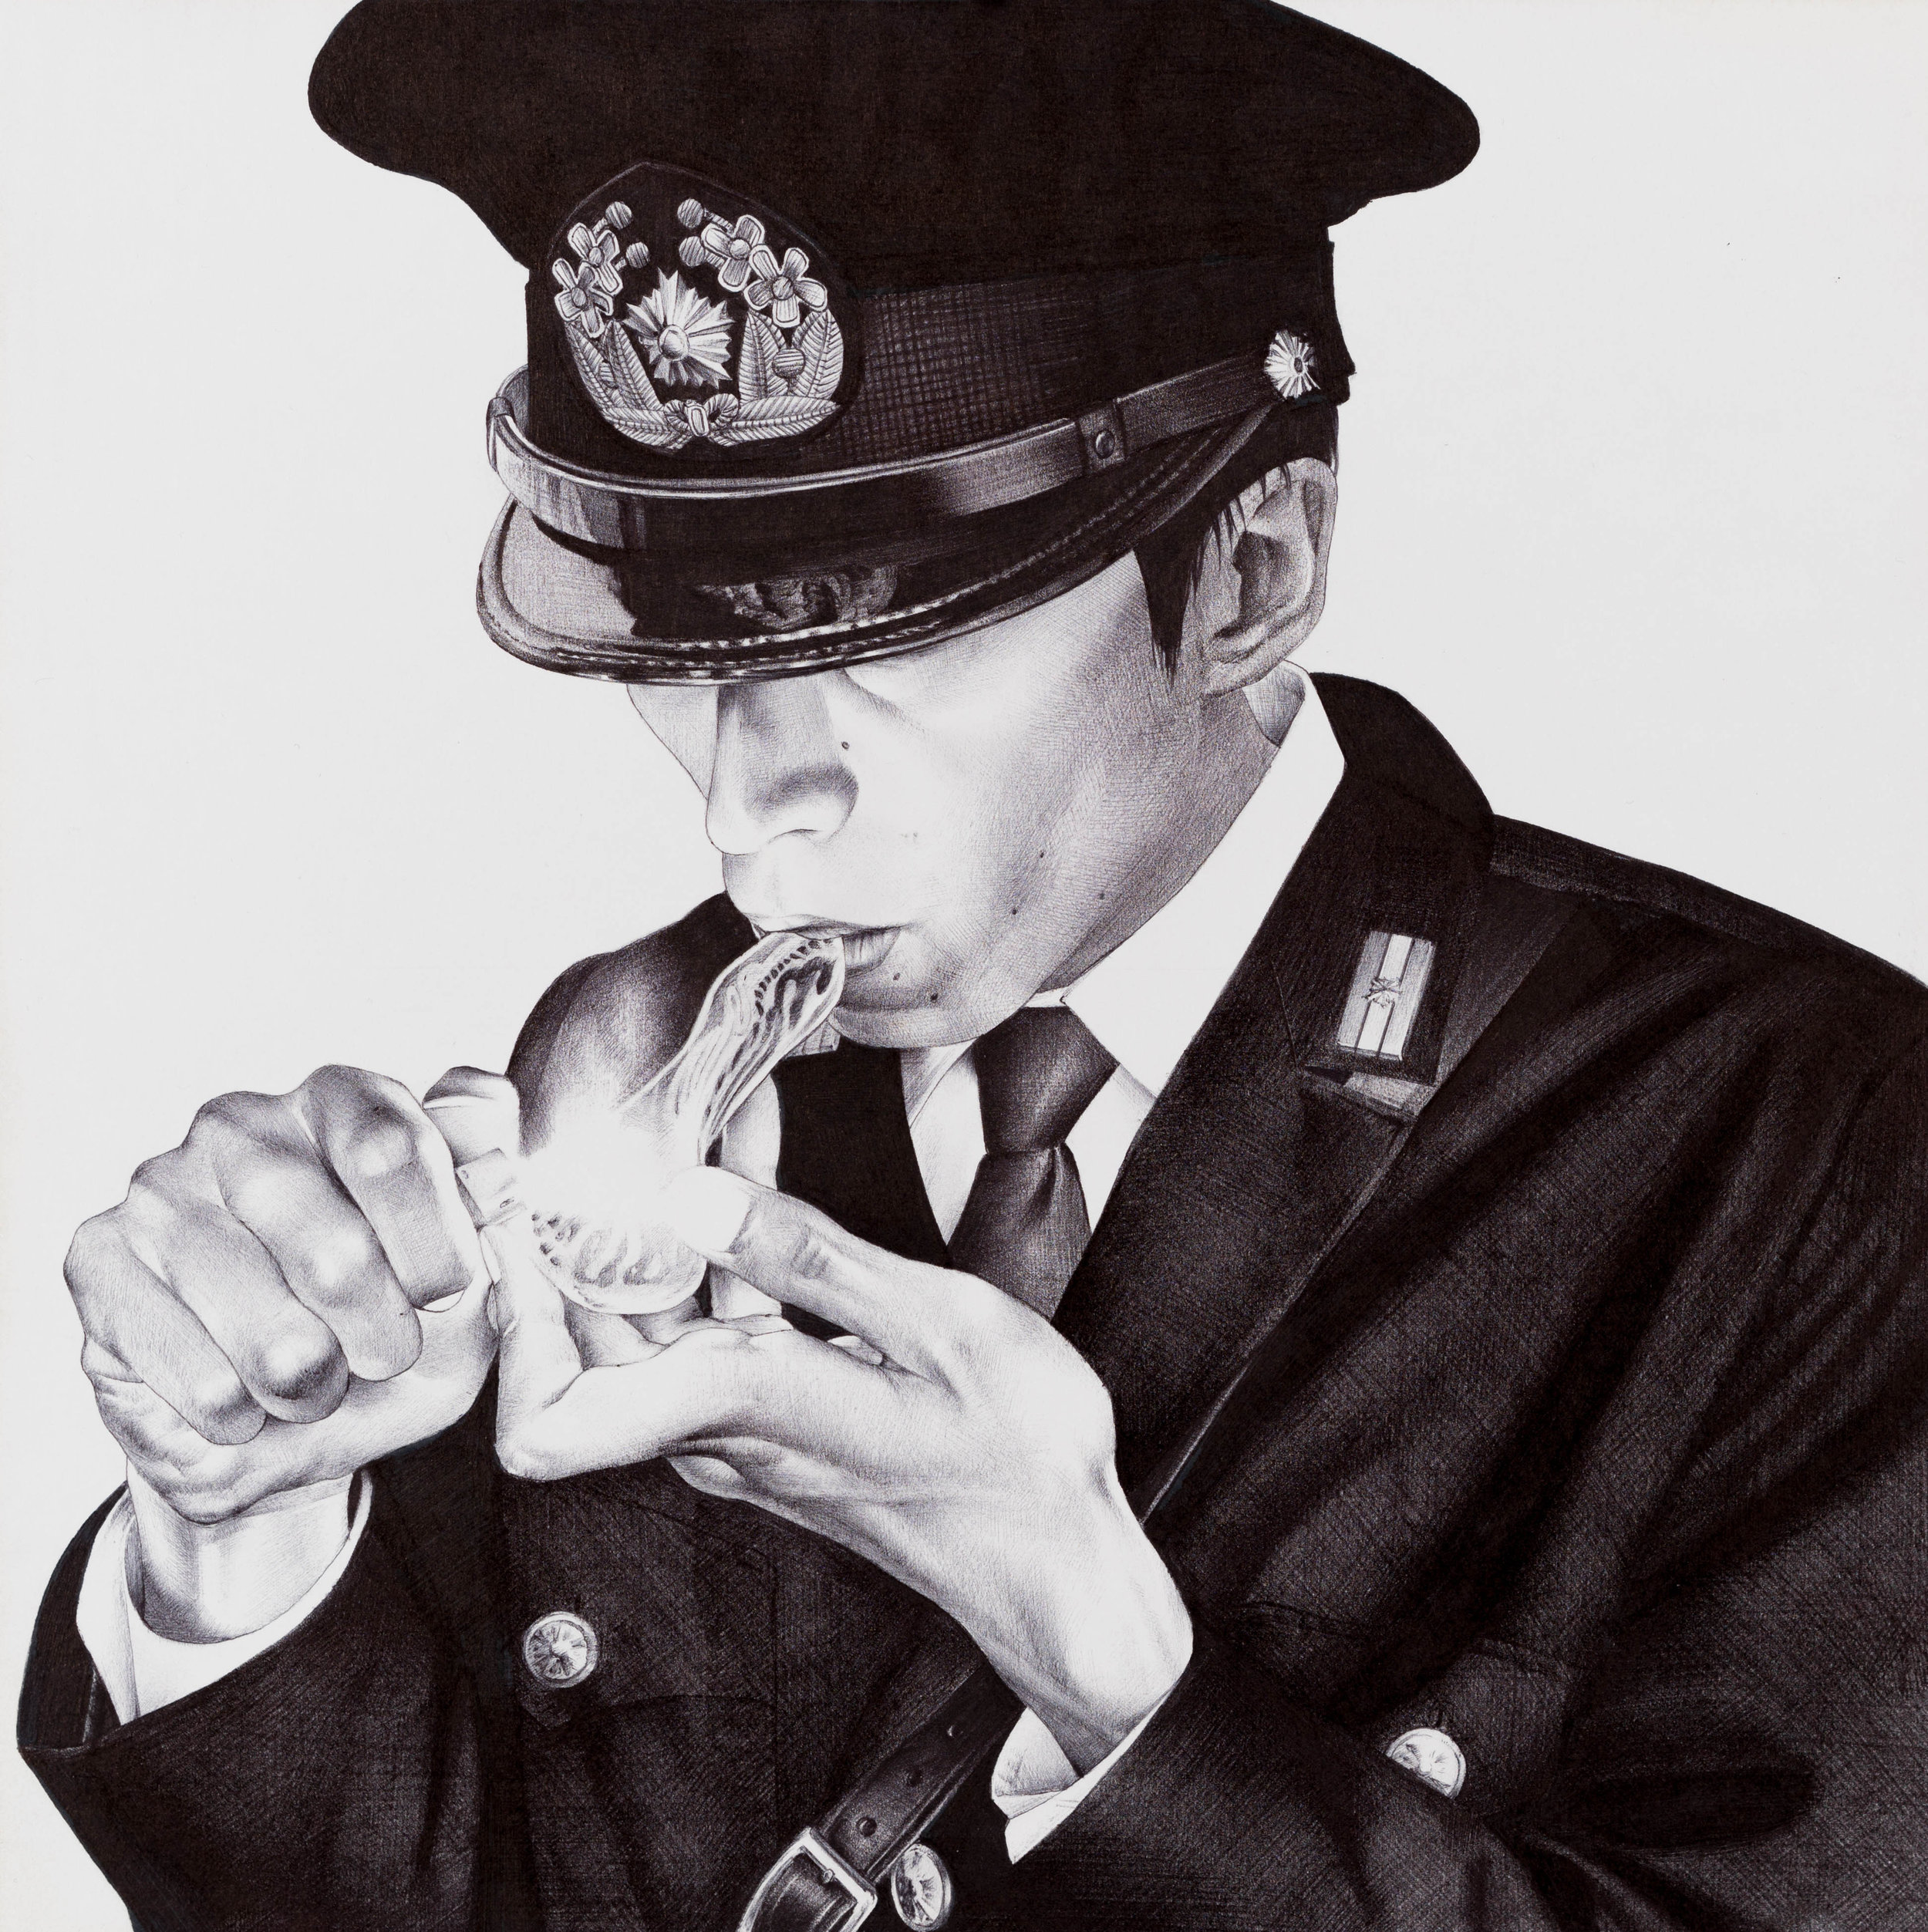 420PD Glass, Ora Ora by Shohei Otomo